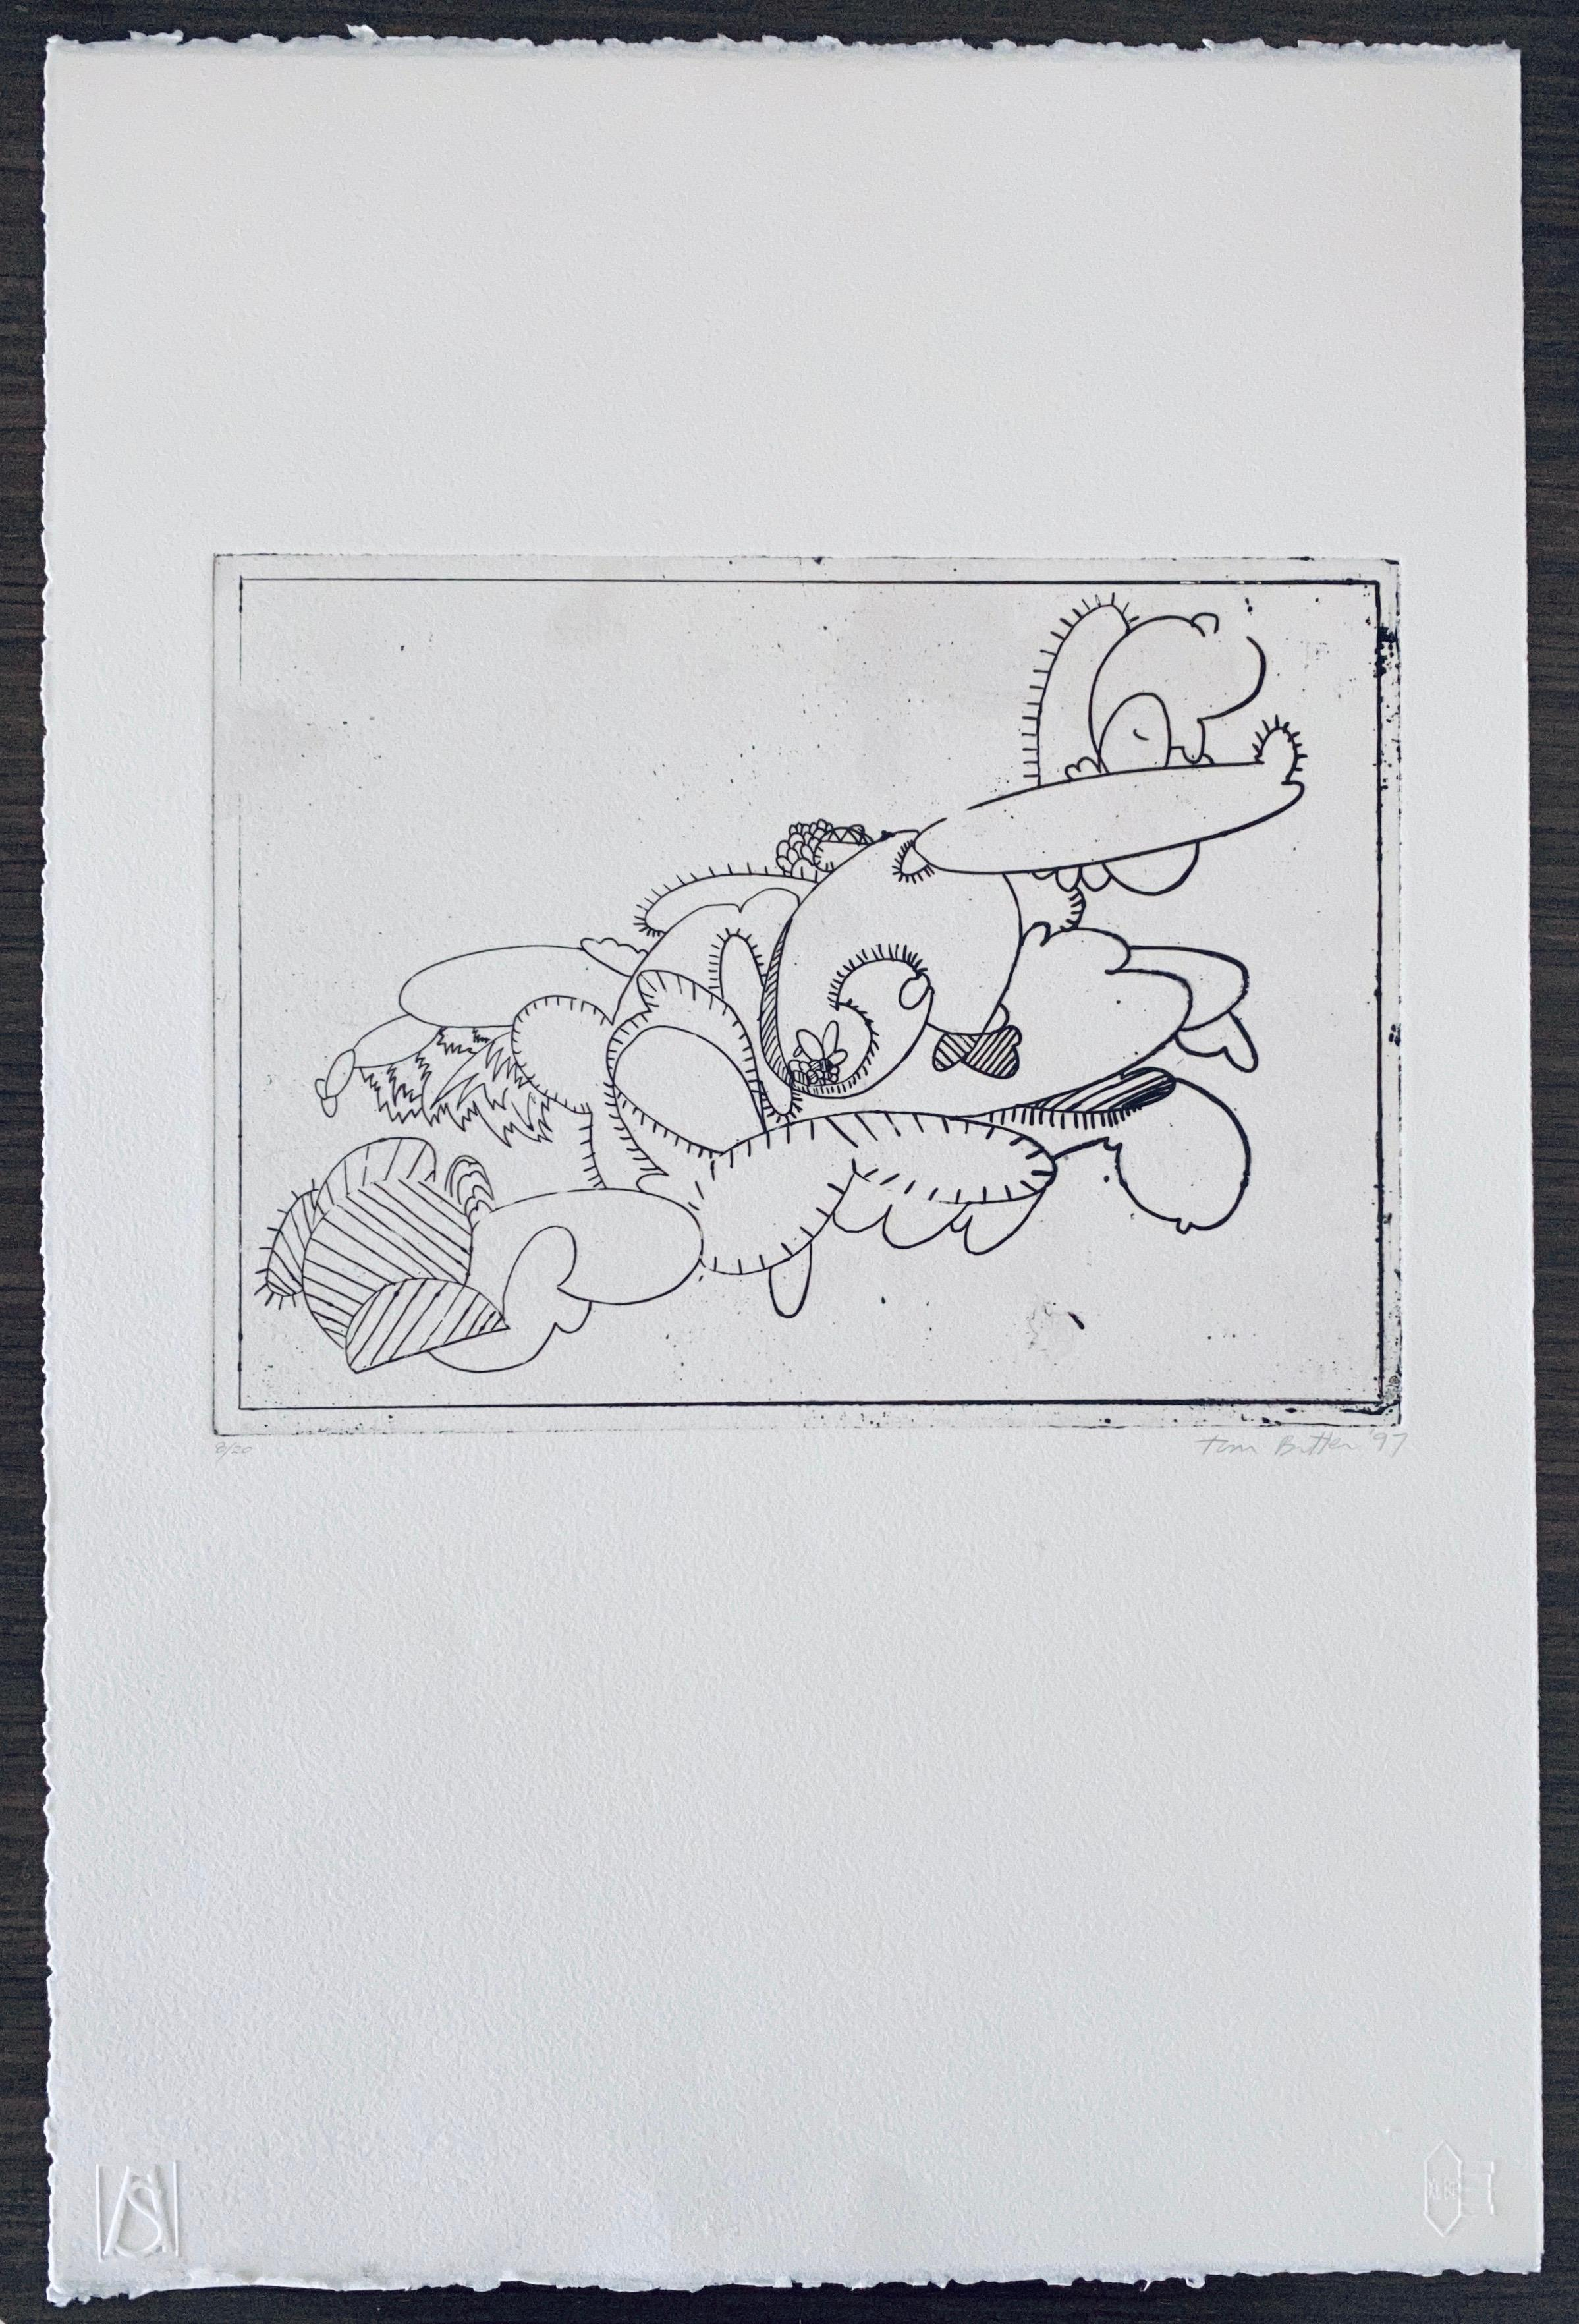 American Artist Contemporary Etching Tom Butter Cartoon Cactus Desert Landscape